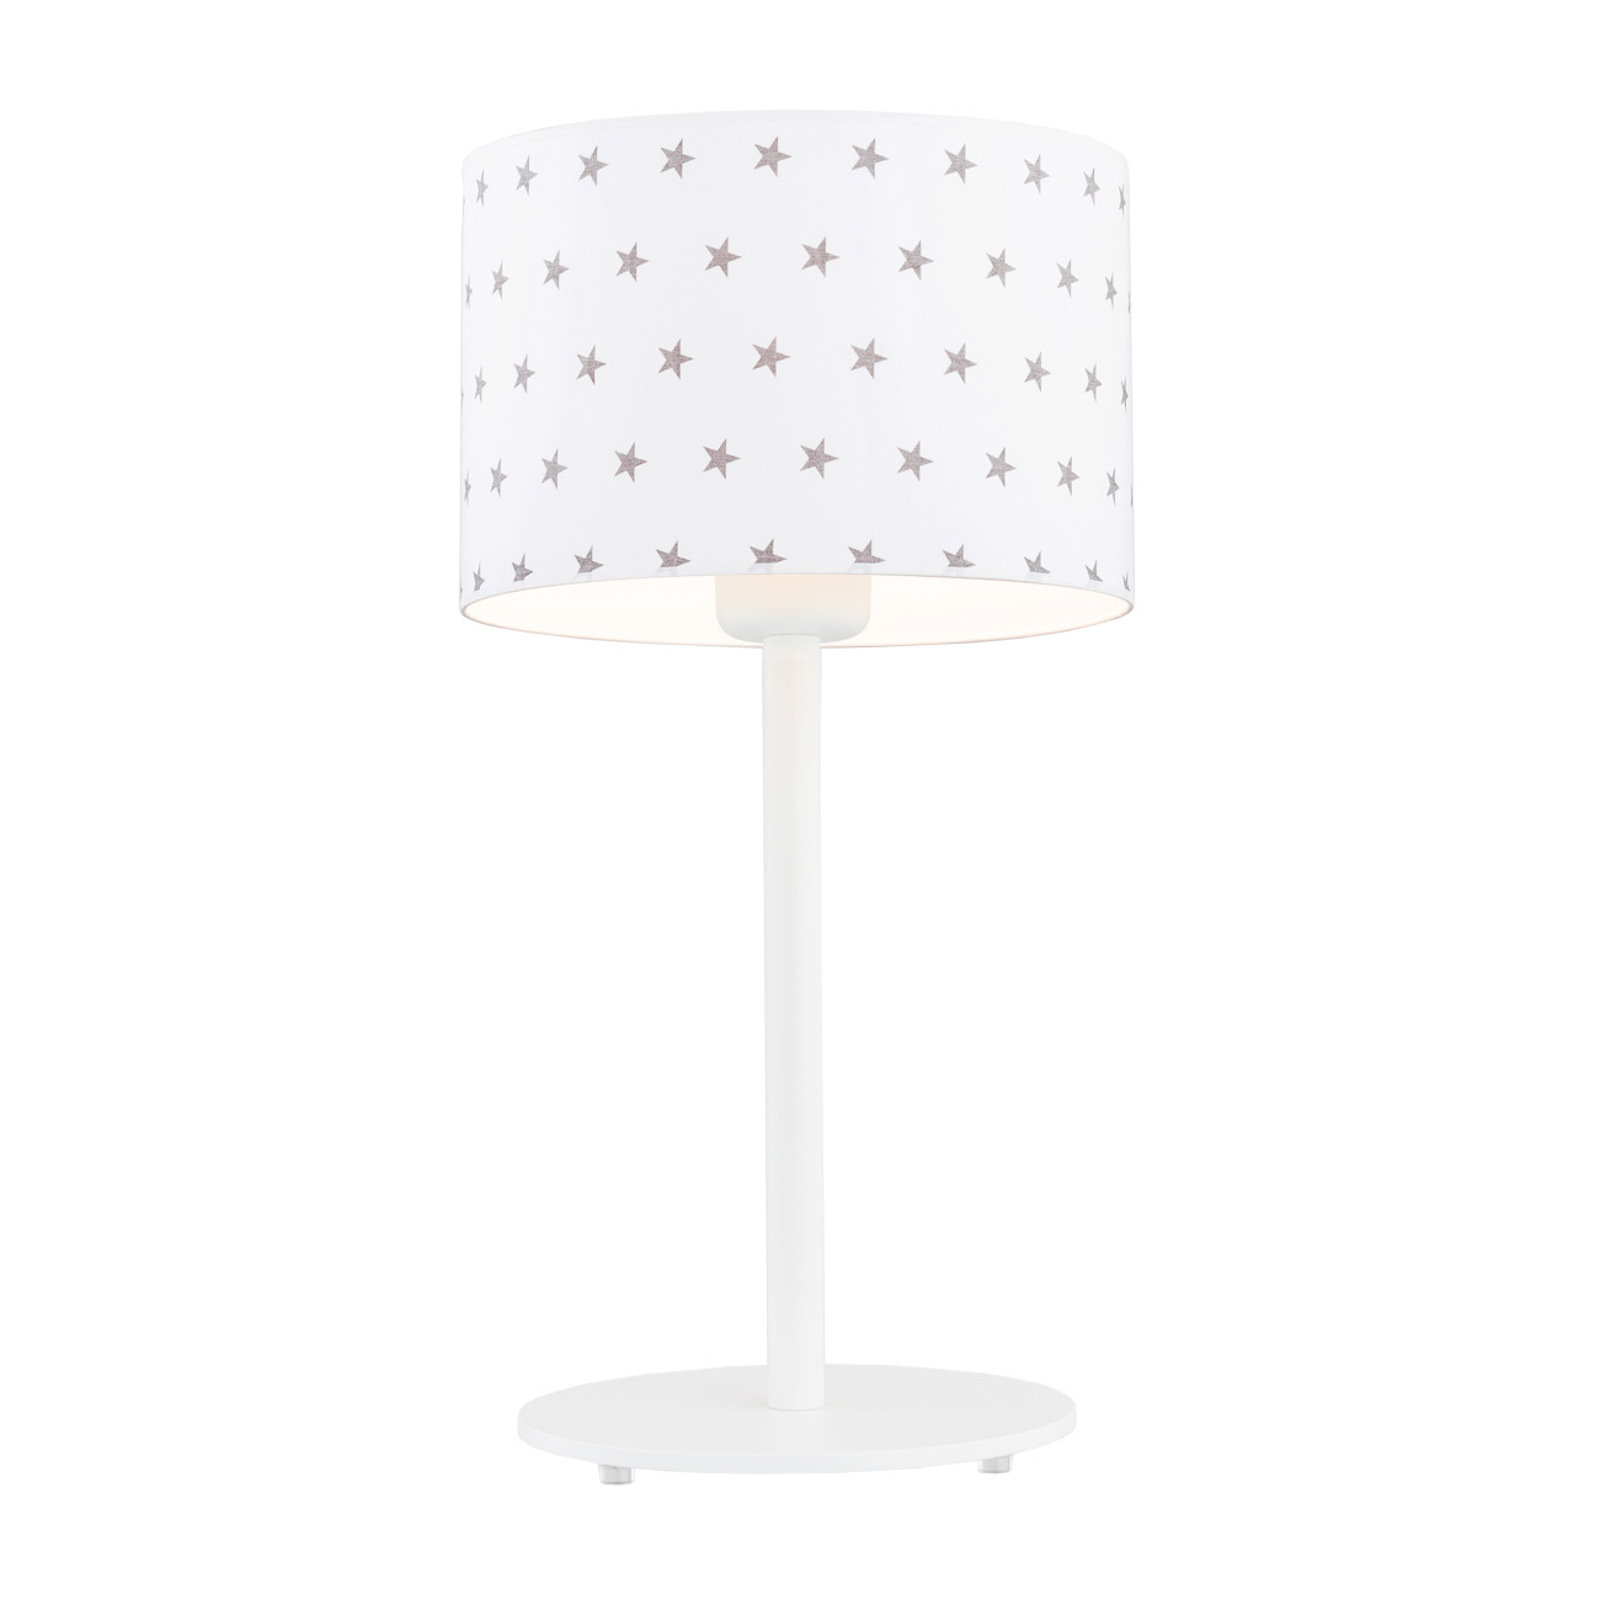 Moa bordlampe, hvid stofskærm/grå stjerner